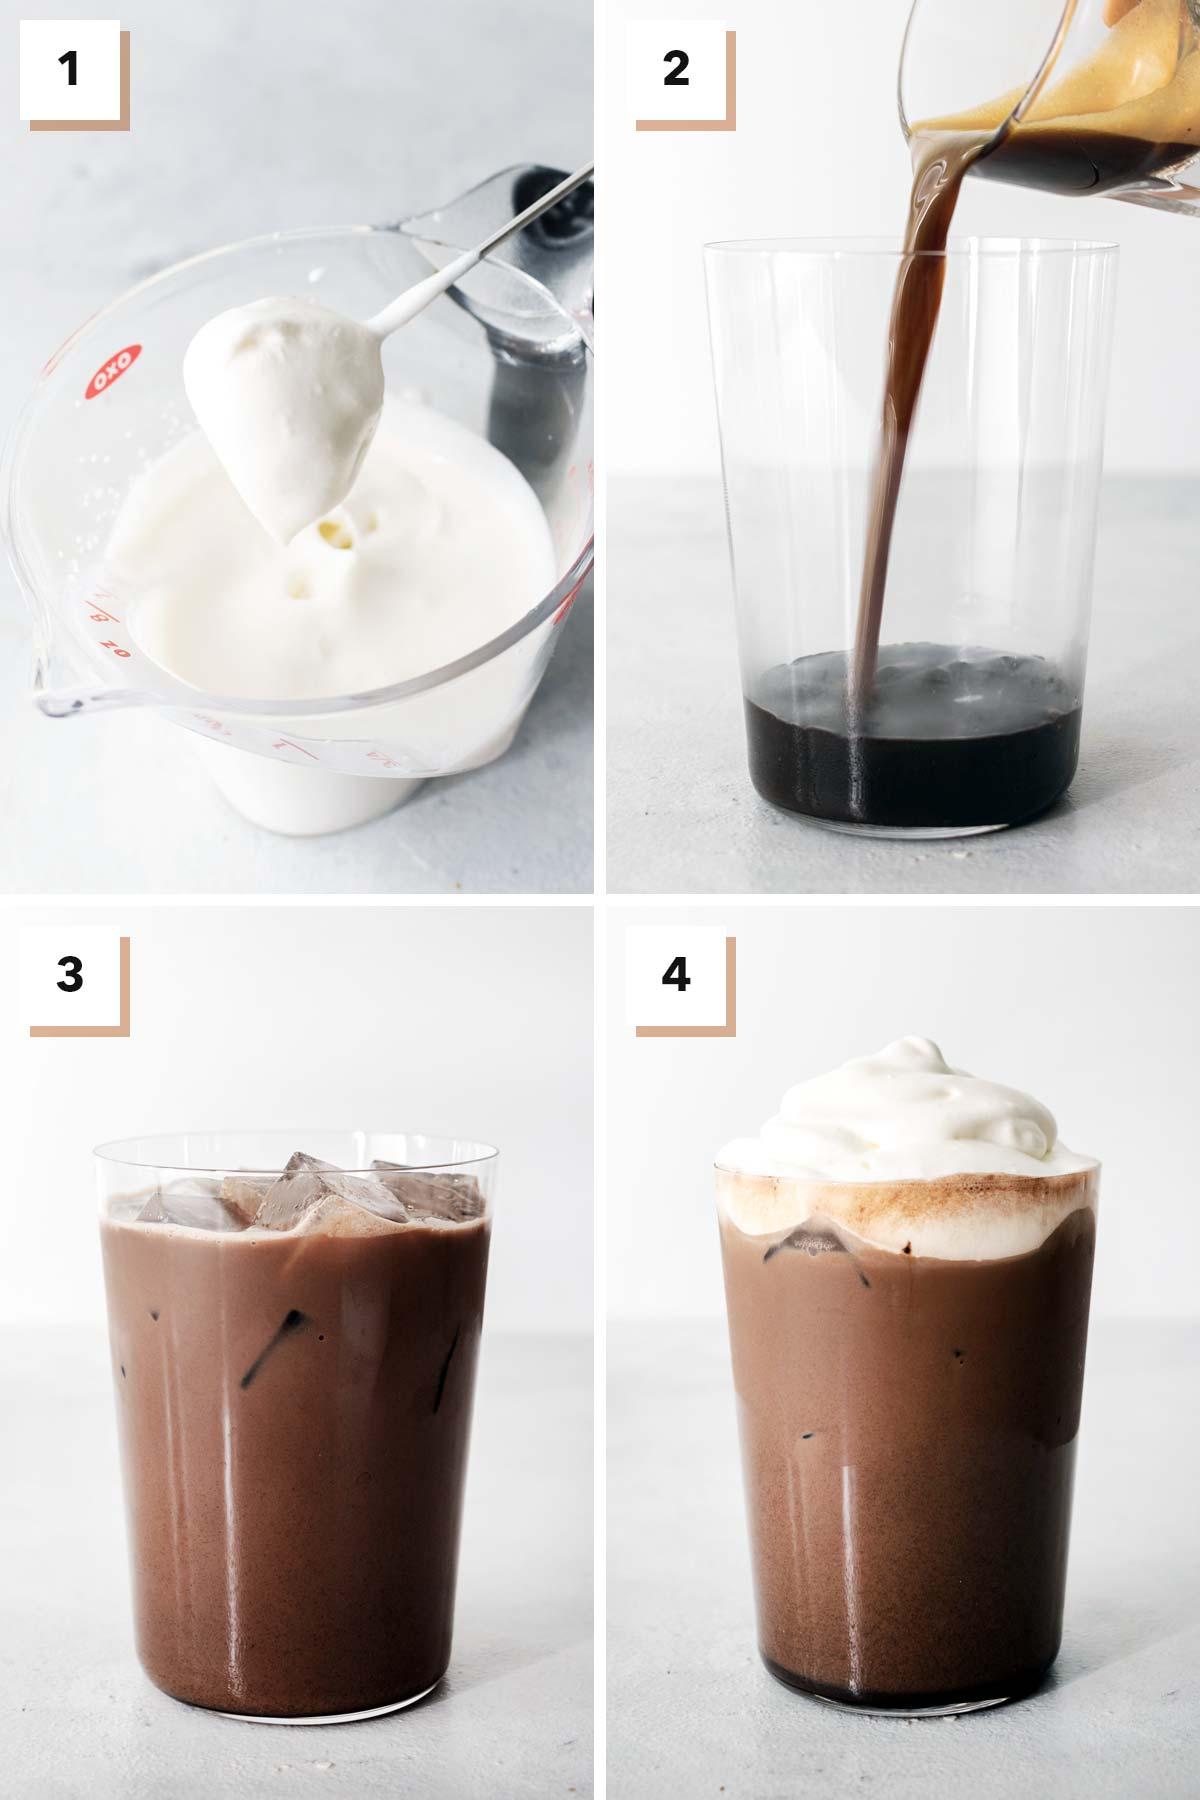 Four photos showing steps to make homemade Starbucks Iced Mocha.